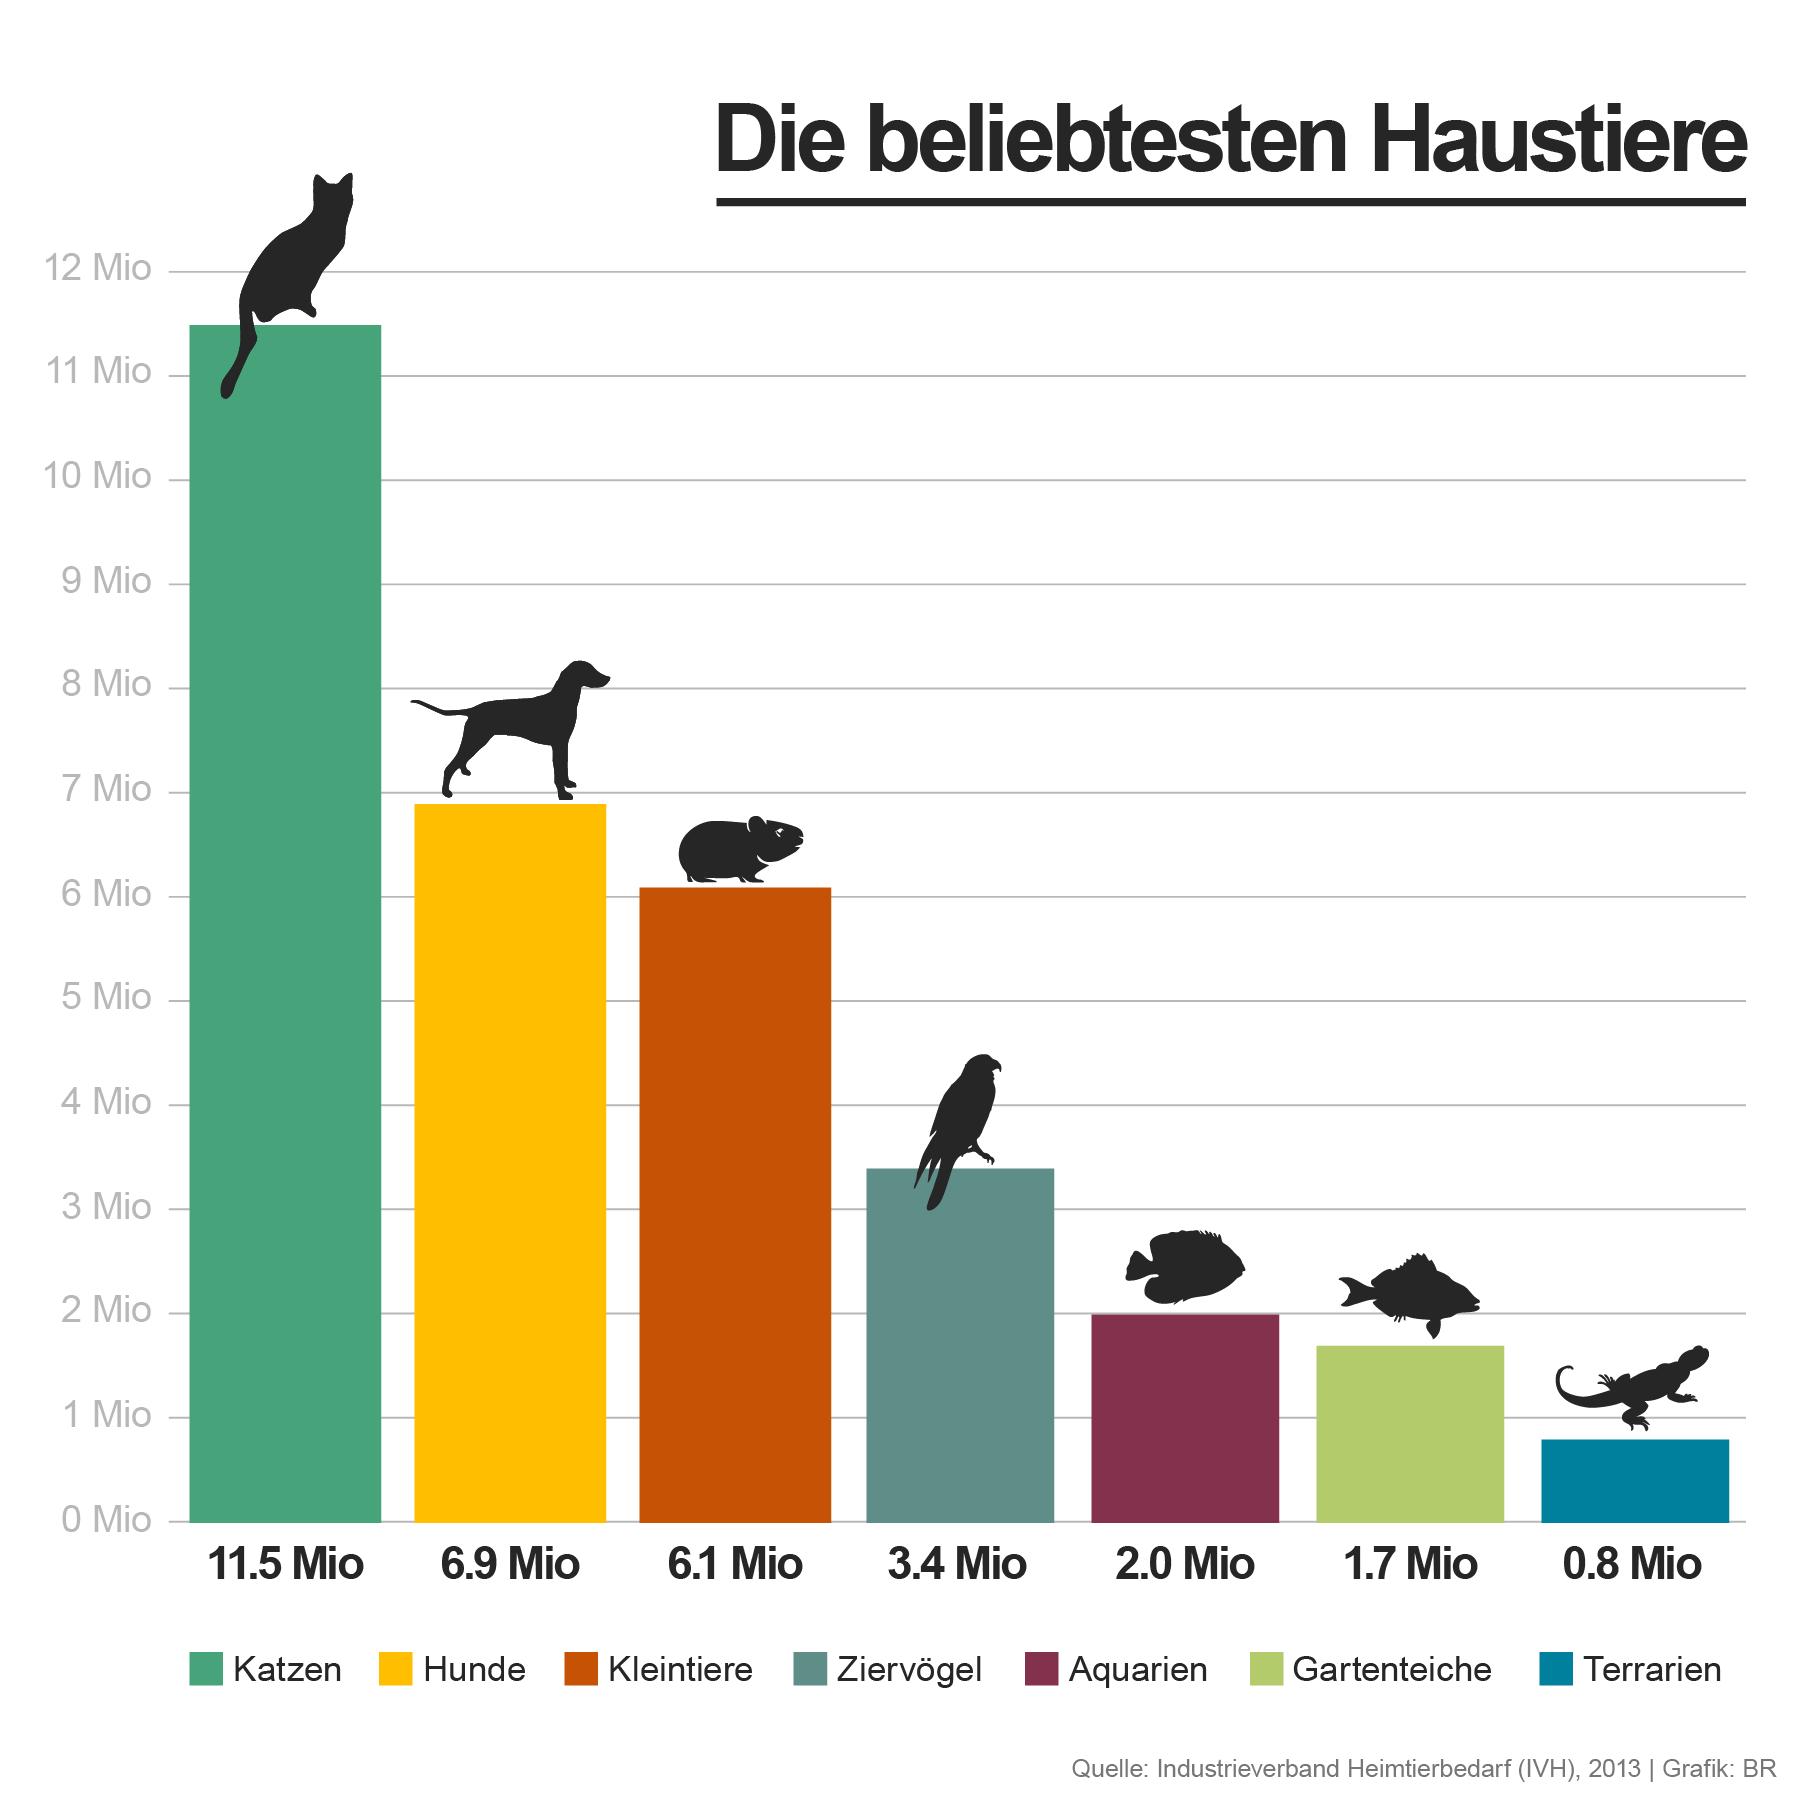 Endearing Coole Haustiere Photo Of Infografik - Die Beliebtesten | Bild: Br/colourbox